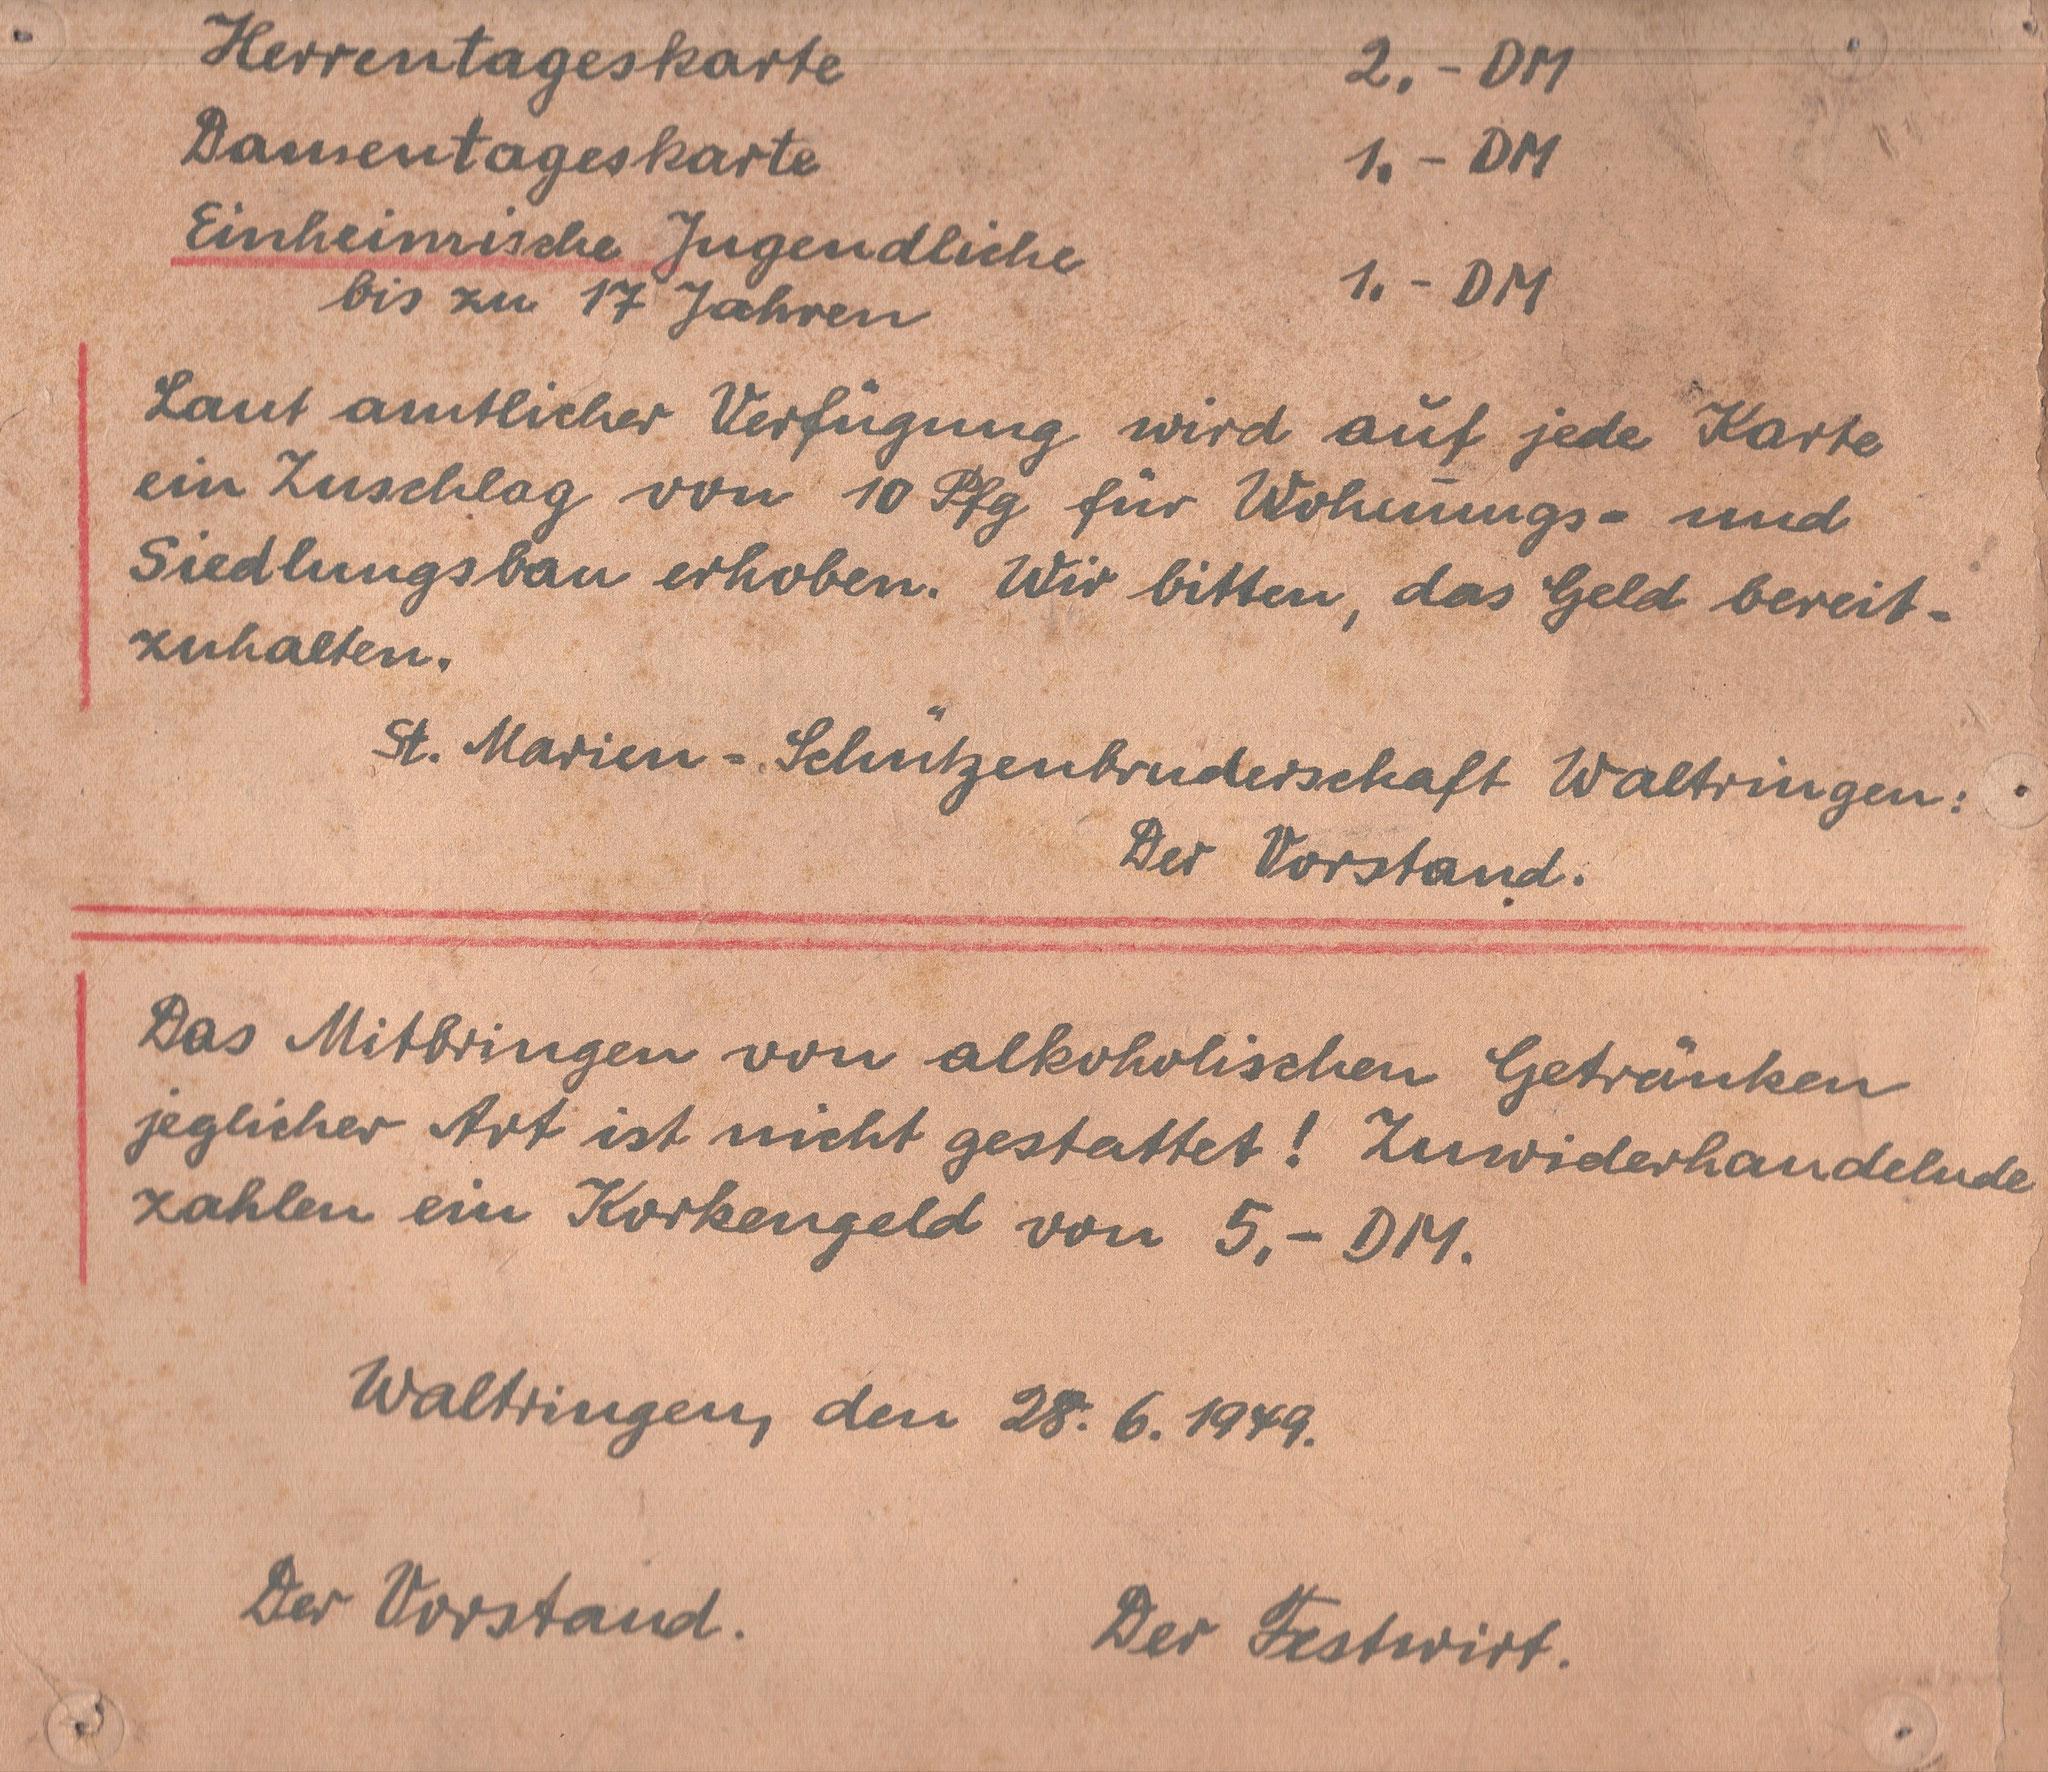 Schützenfest 1949: Festordnung!